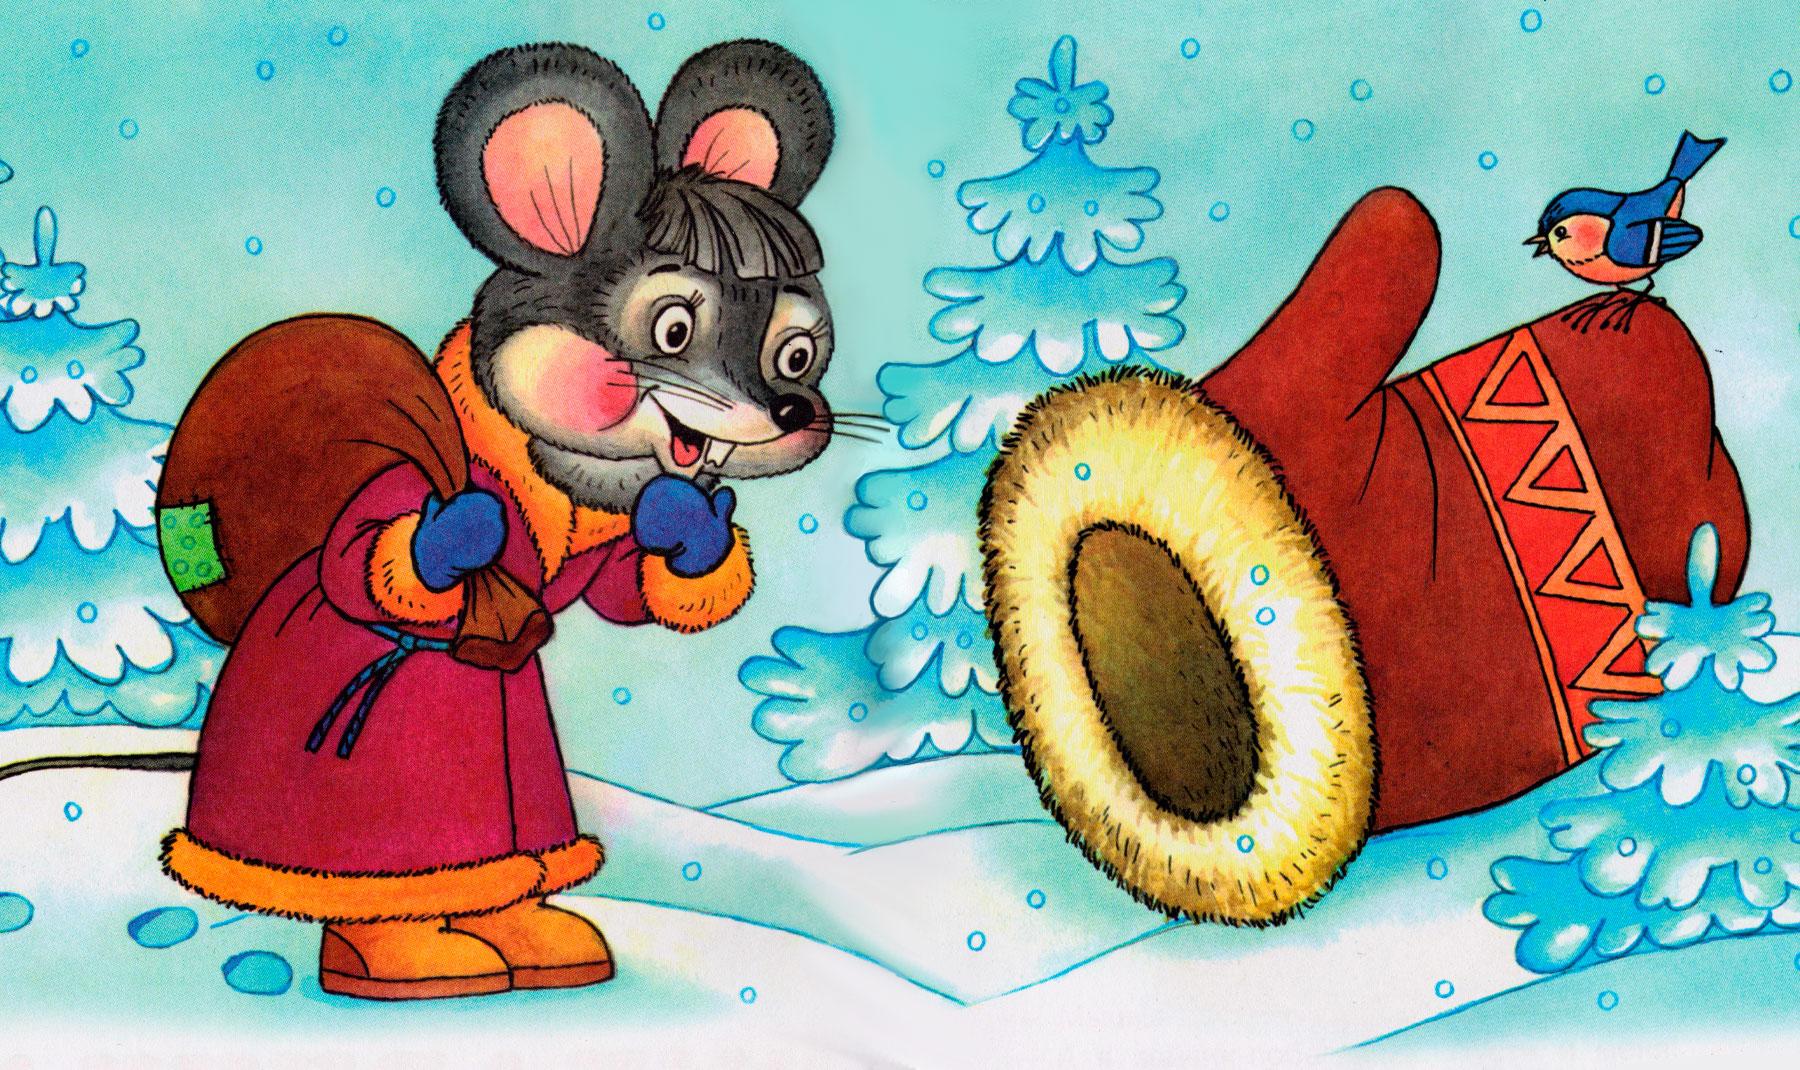 картинка волка из сказки рукавичка думаете это